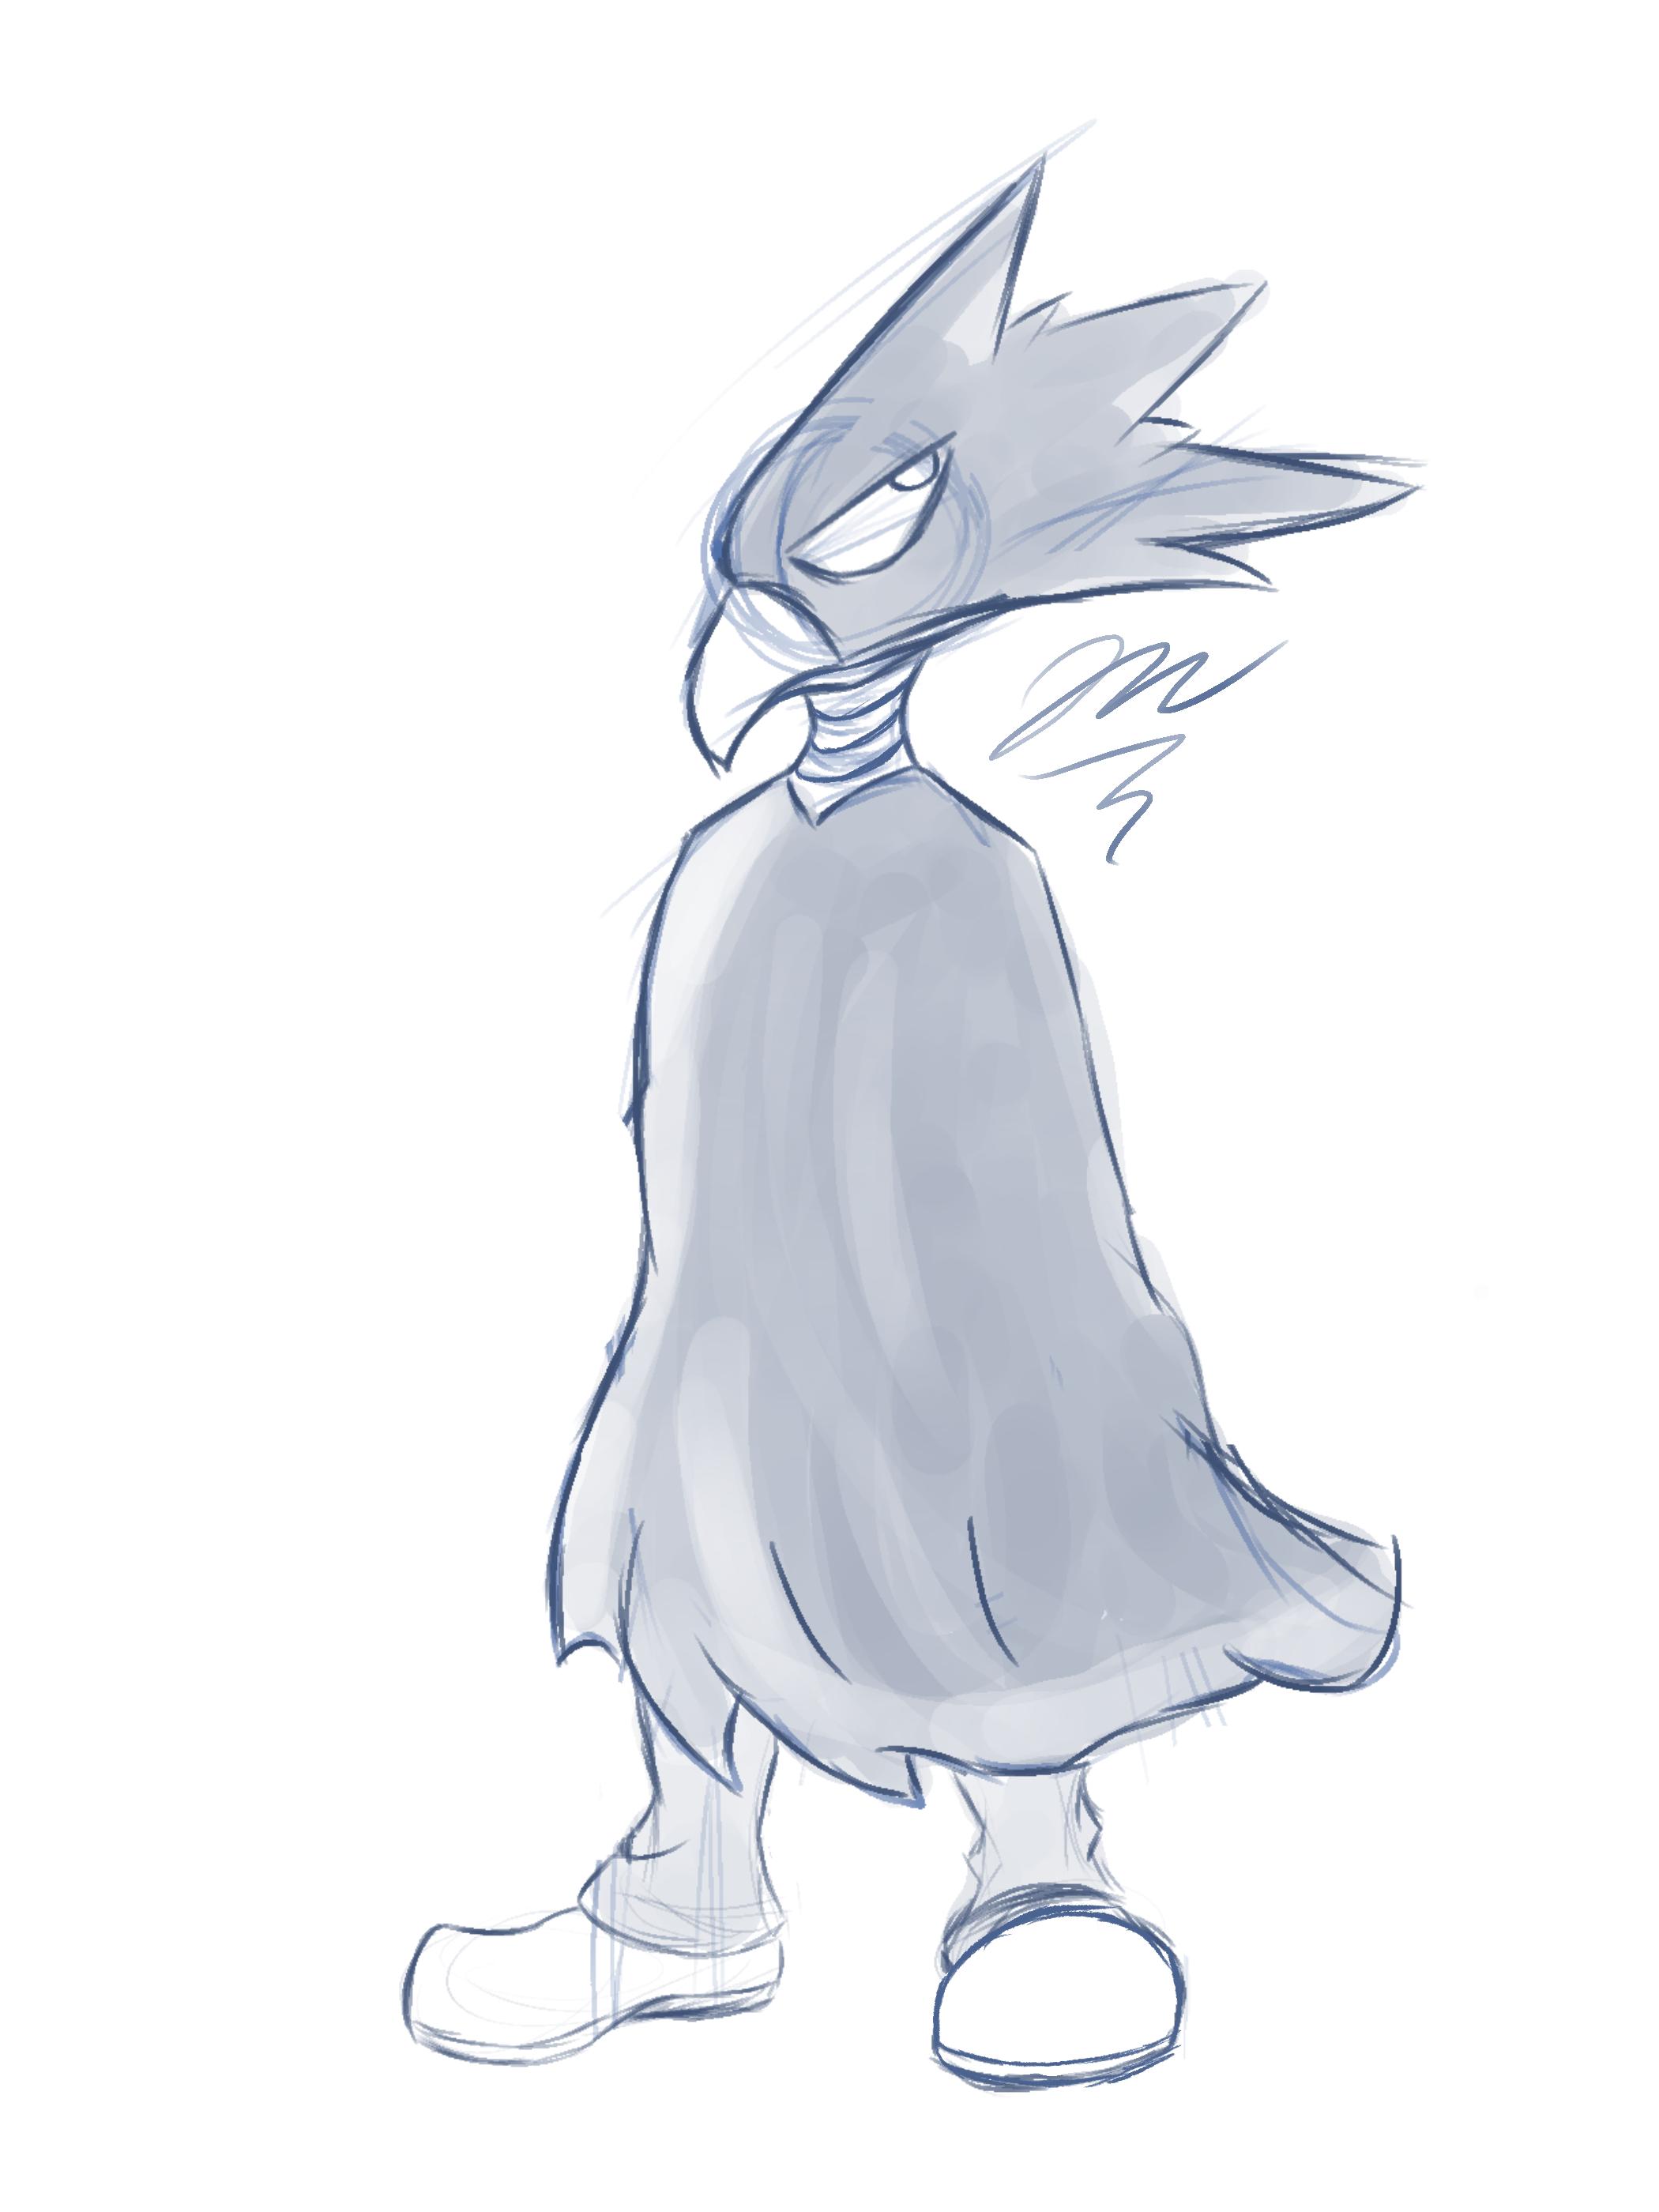 Crow guy